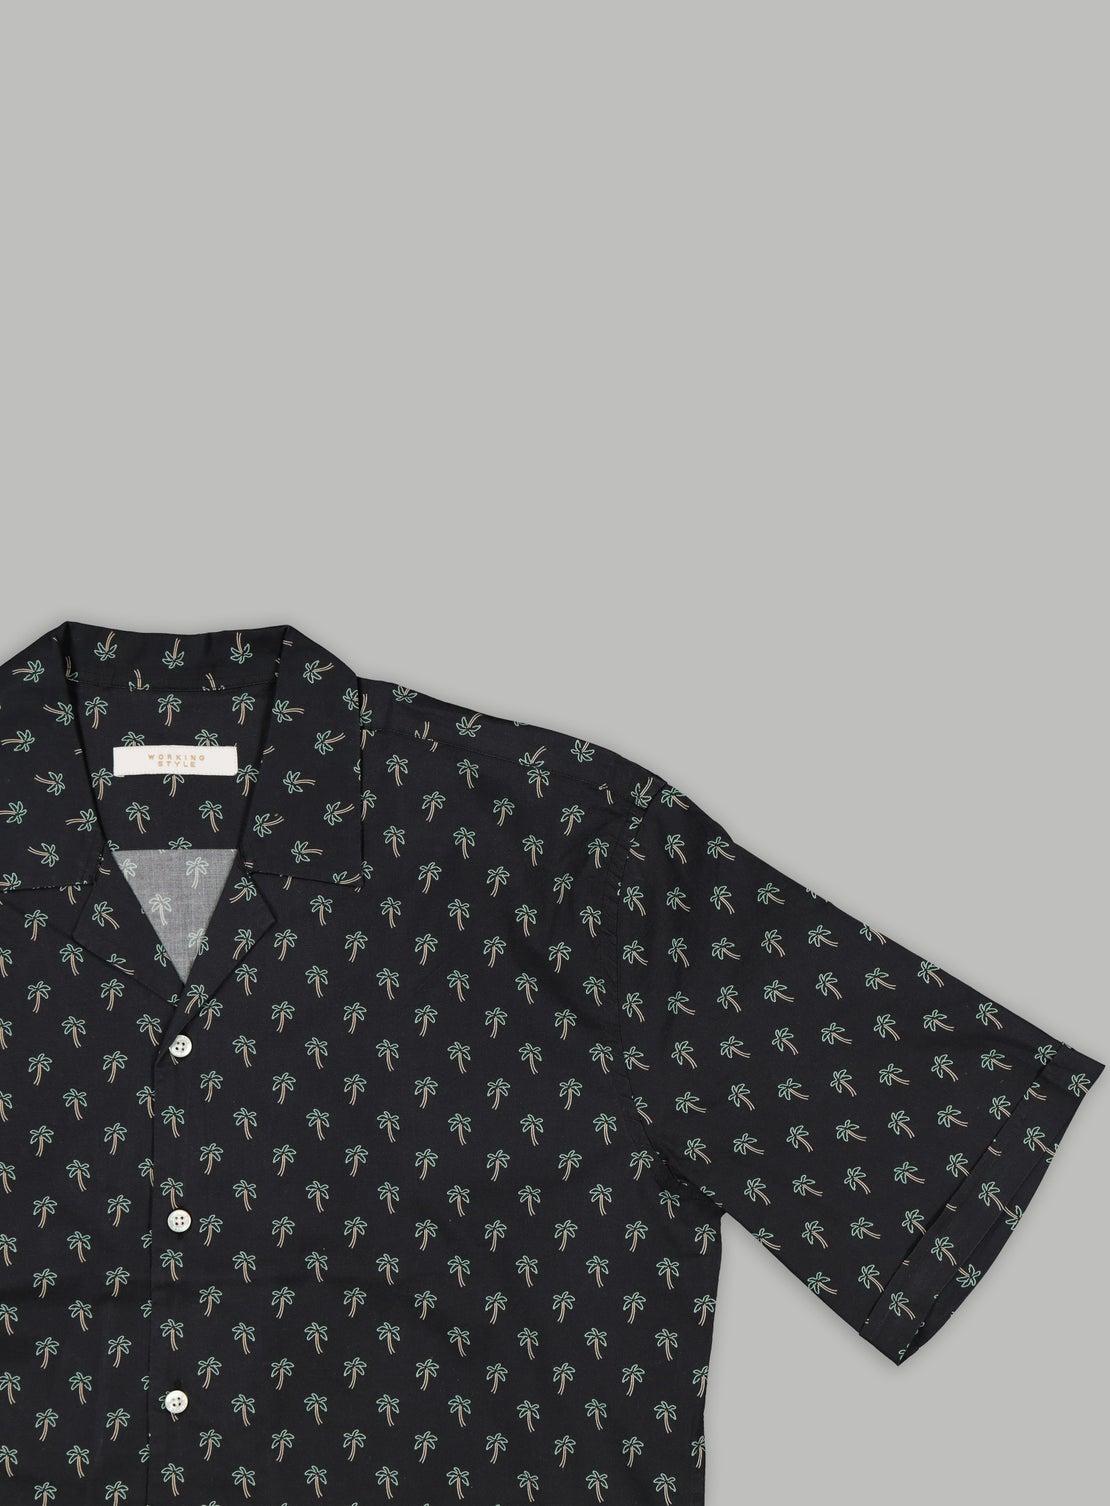 Tropicana Stretch Short Sleeve Shirt